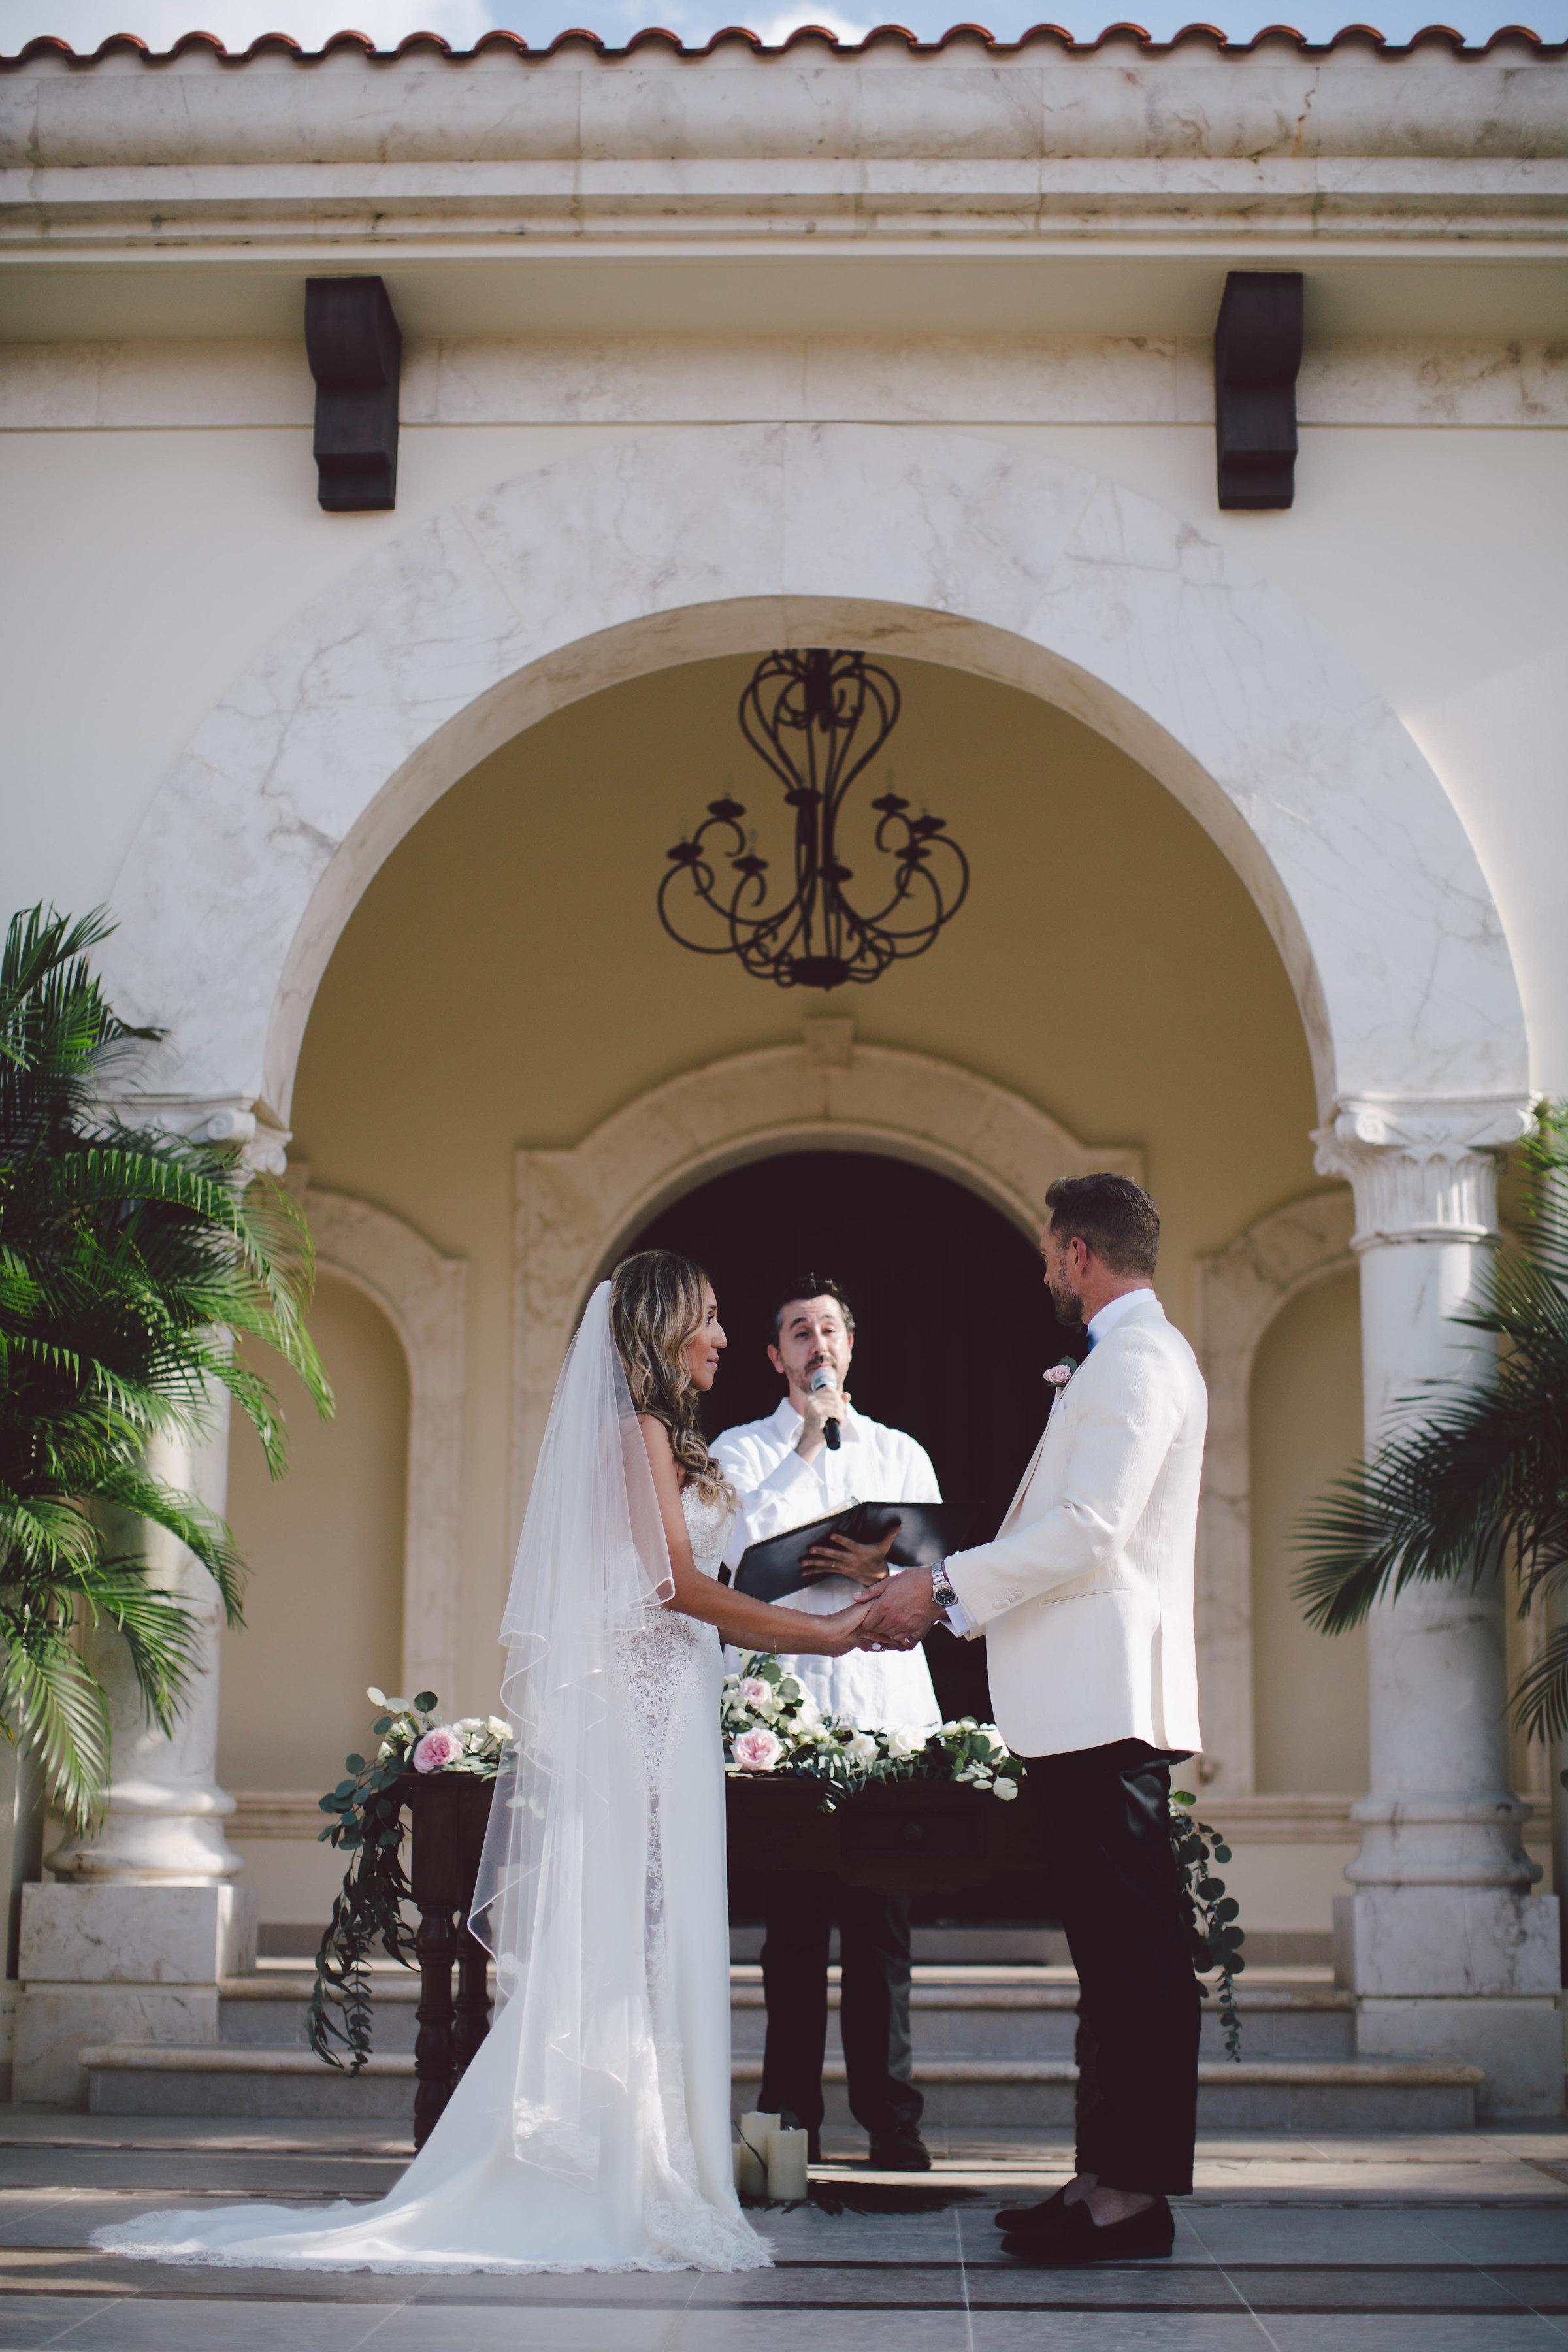 mexico_wedding_cancun_villa_la_joya_evangeline_lane_051.jpg